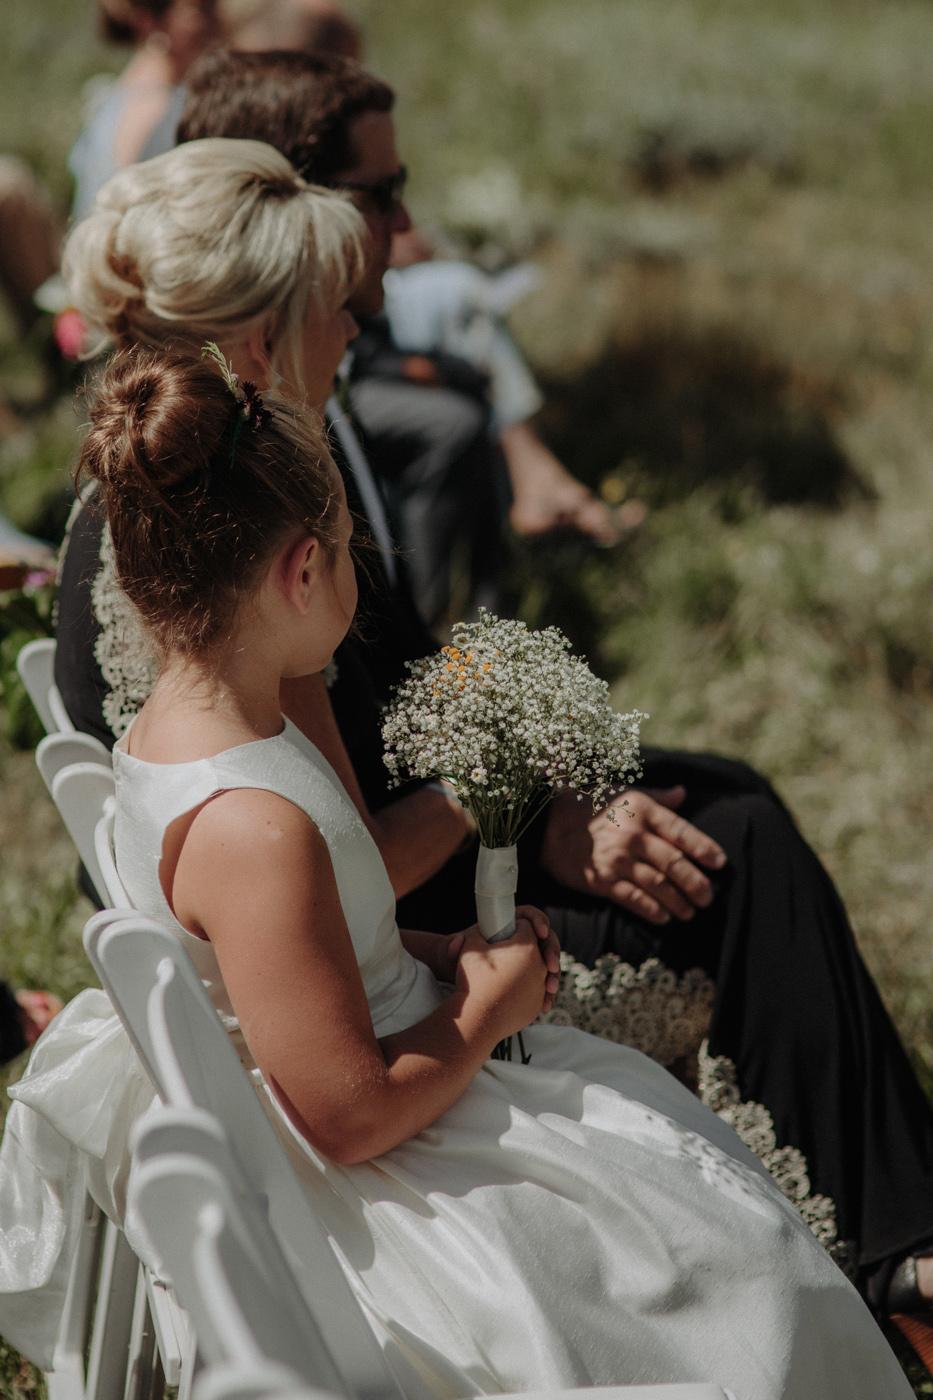 woods-walk-trail-crested-butte-colorado-wedding-45.jpg